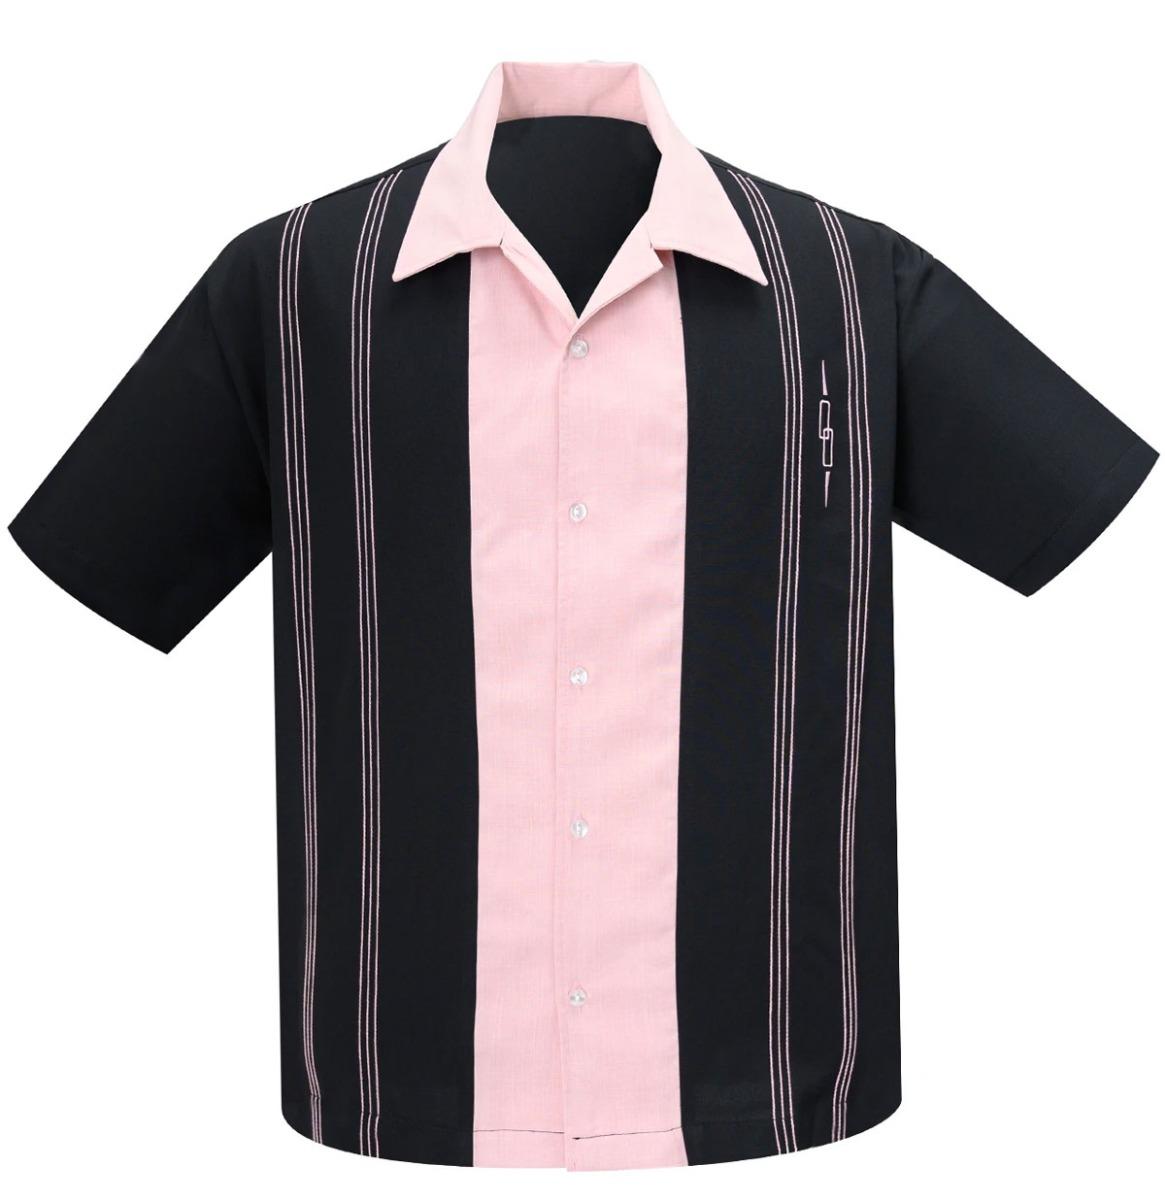 Steady Clothing The Harper Shirt Zwart / Roze